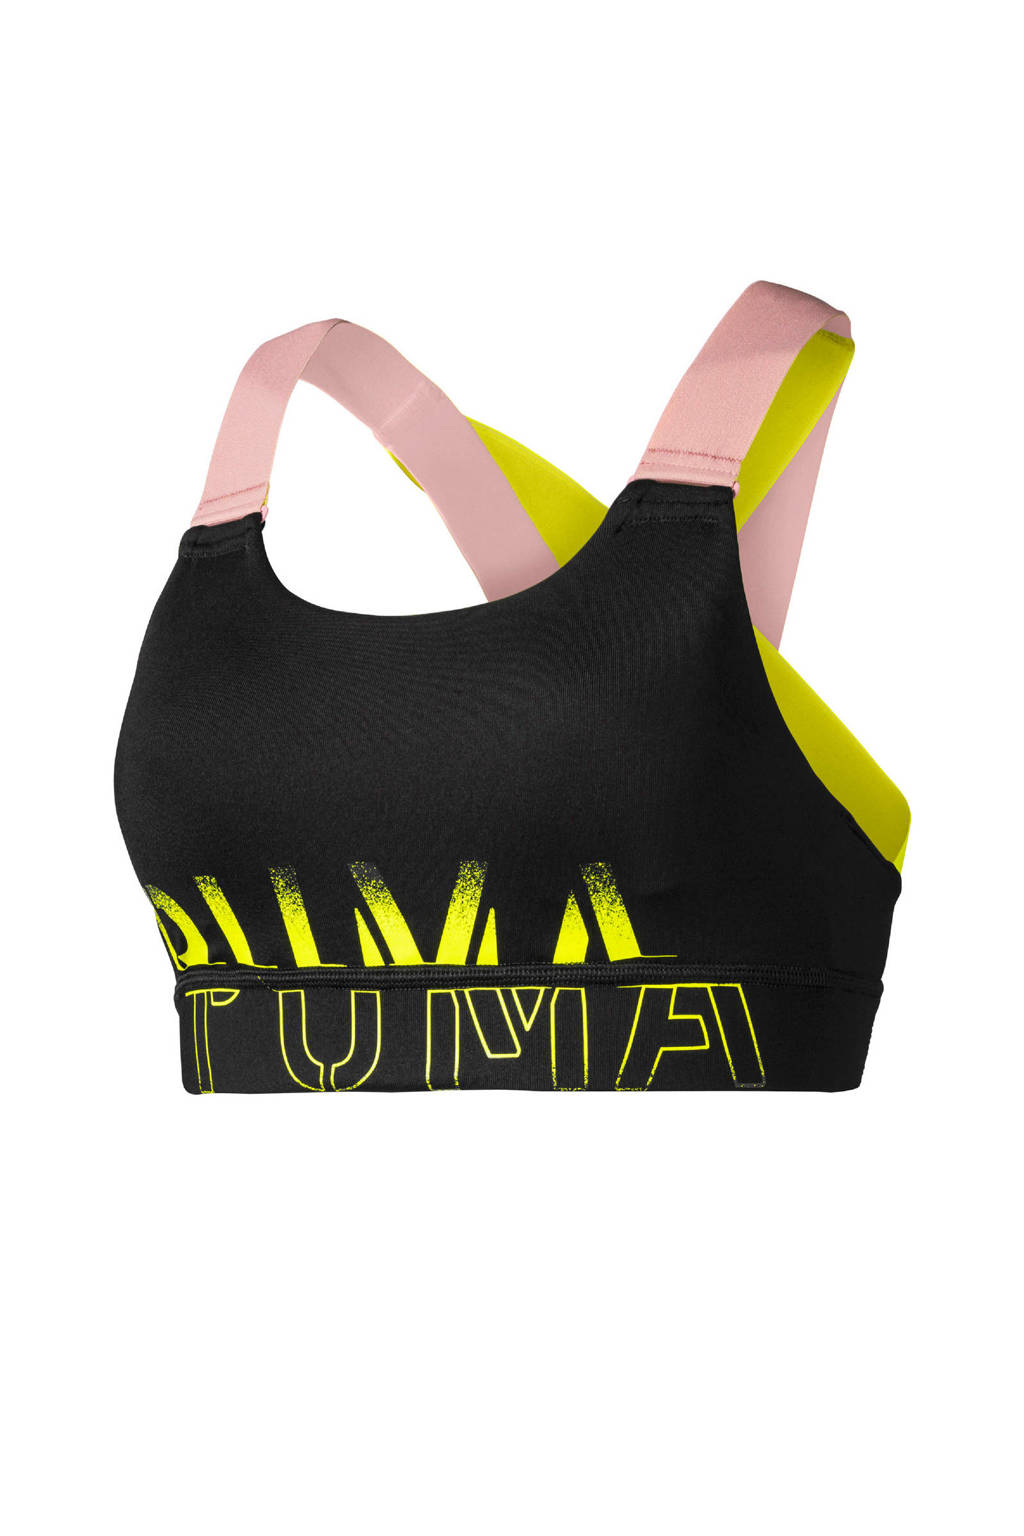 Puma Level 3 sportbh zwart, Zwart/roze/geel